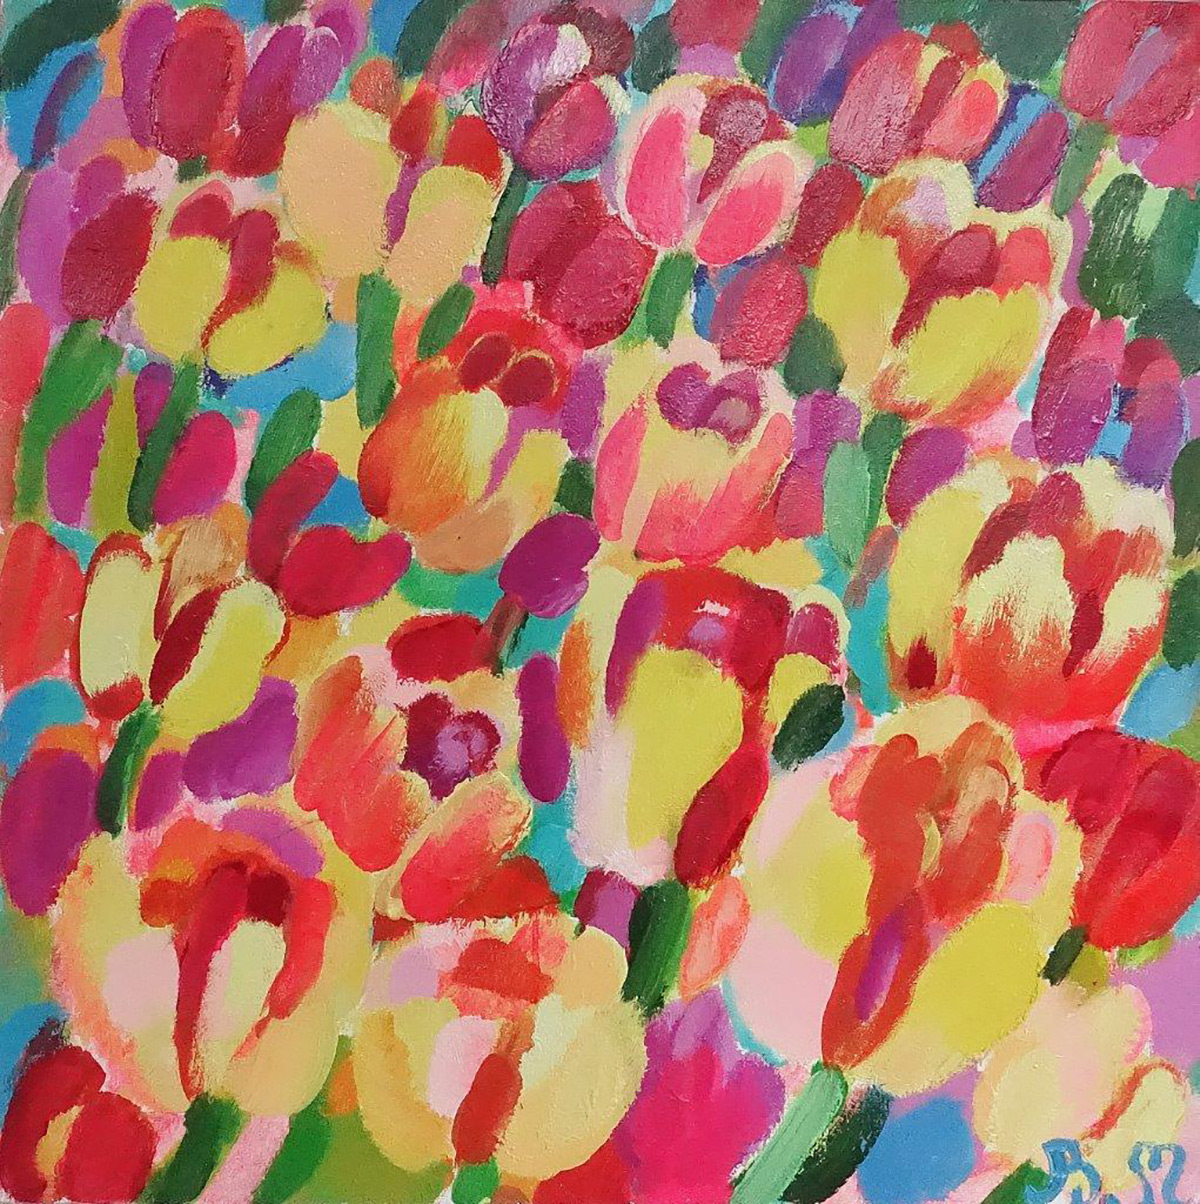 Beata Murawska : It's spring already